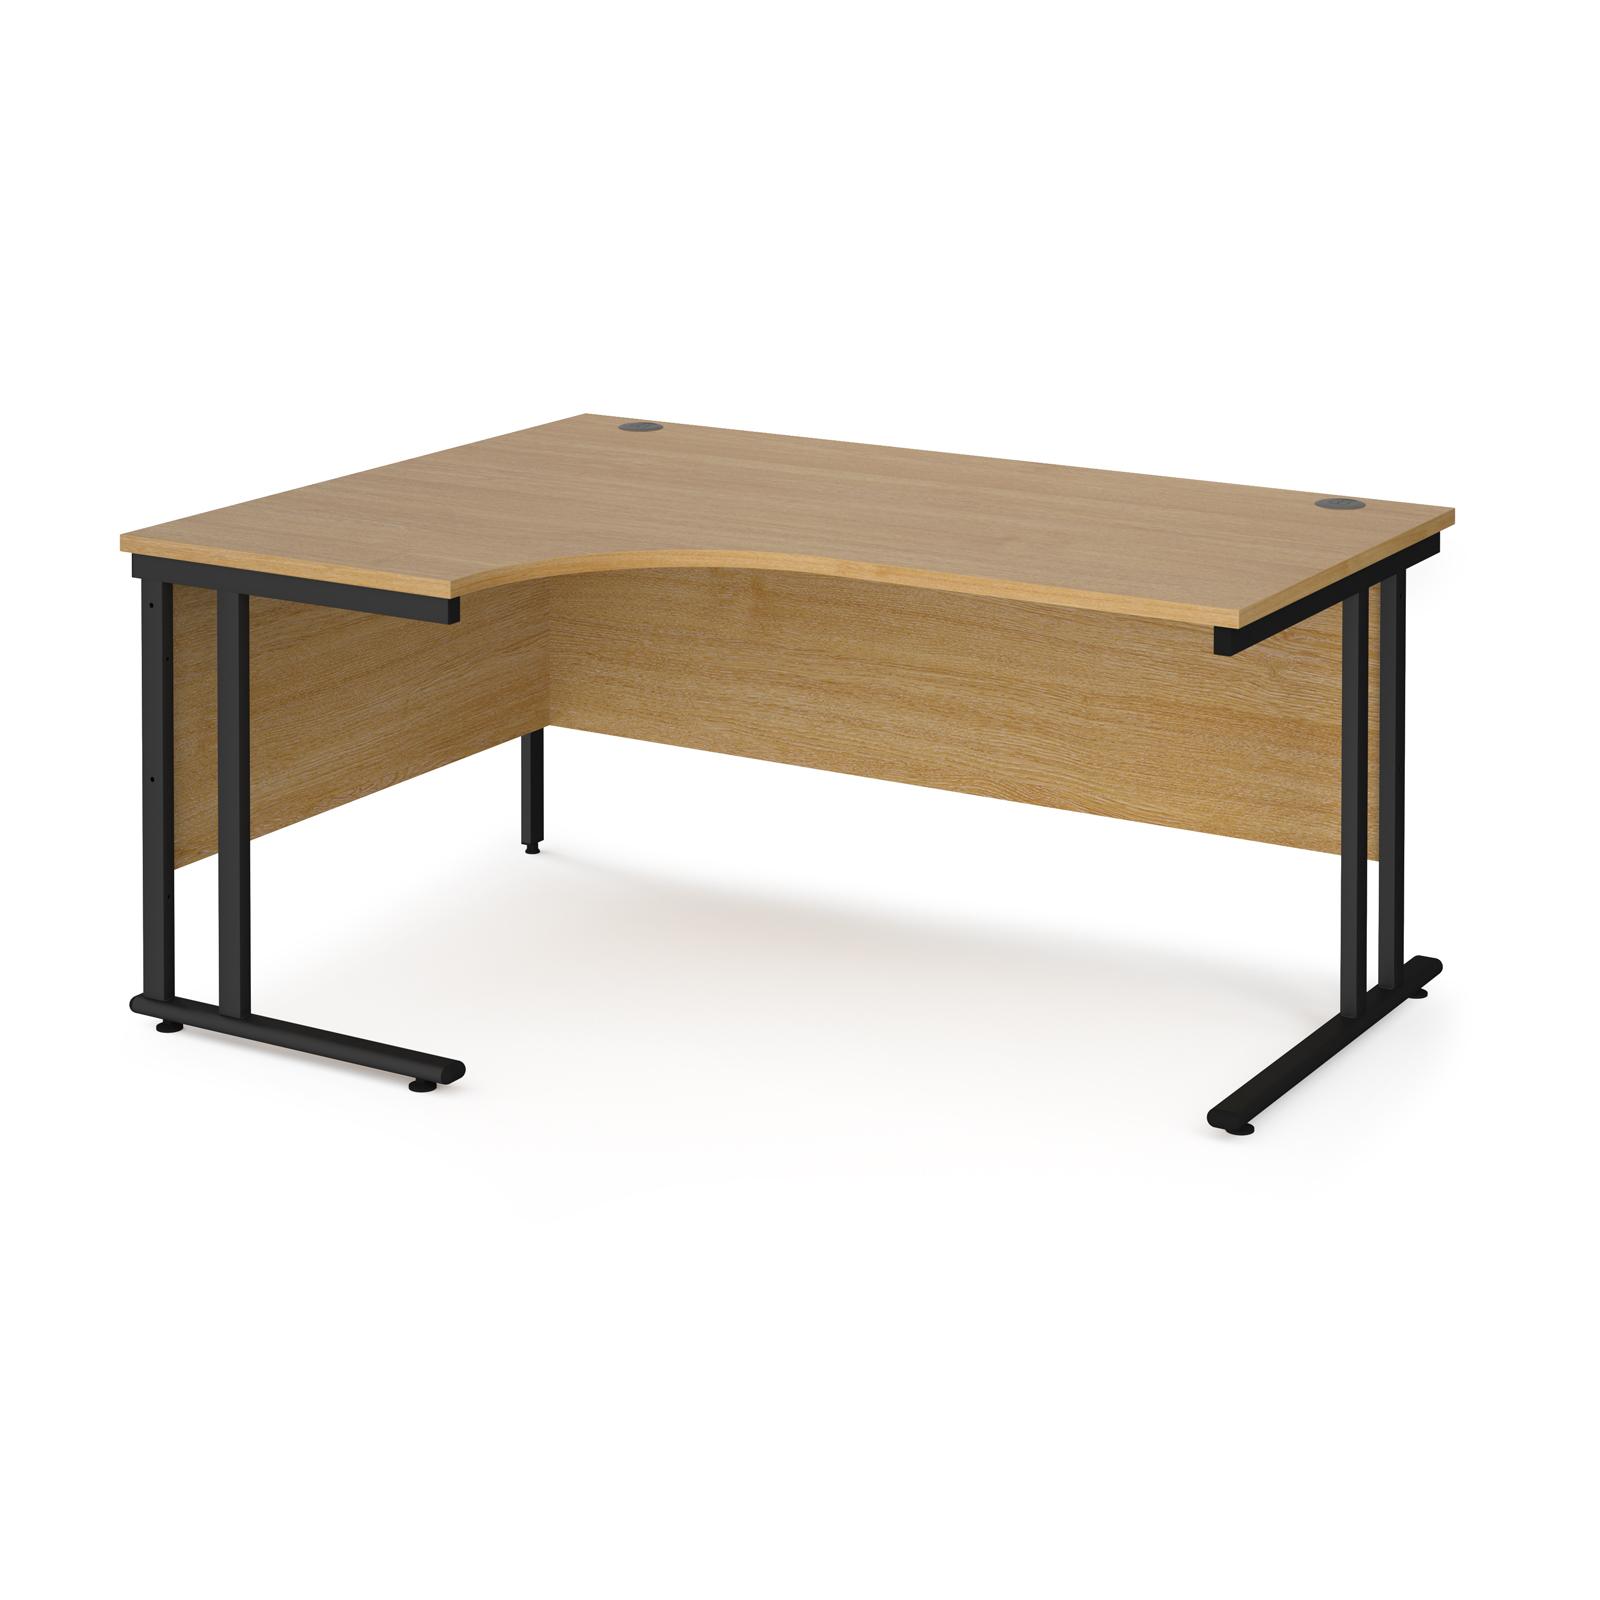 Maestro 25 left hand ergonomic desk 1600mm wide - black cantilever leg frame, oak top